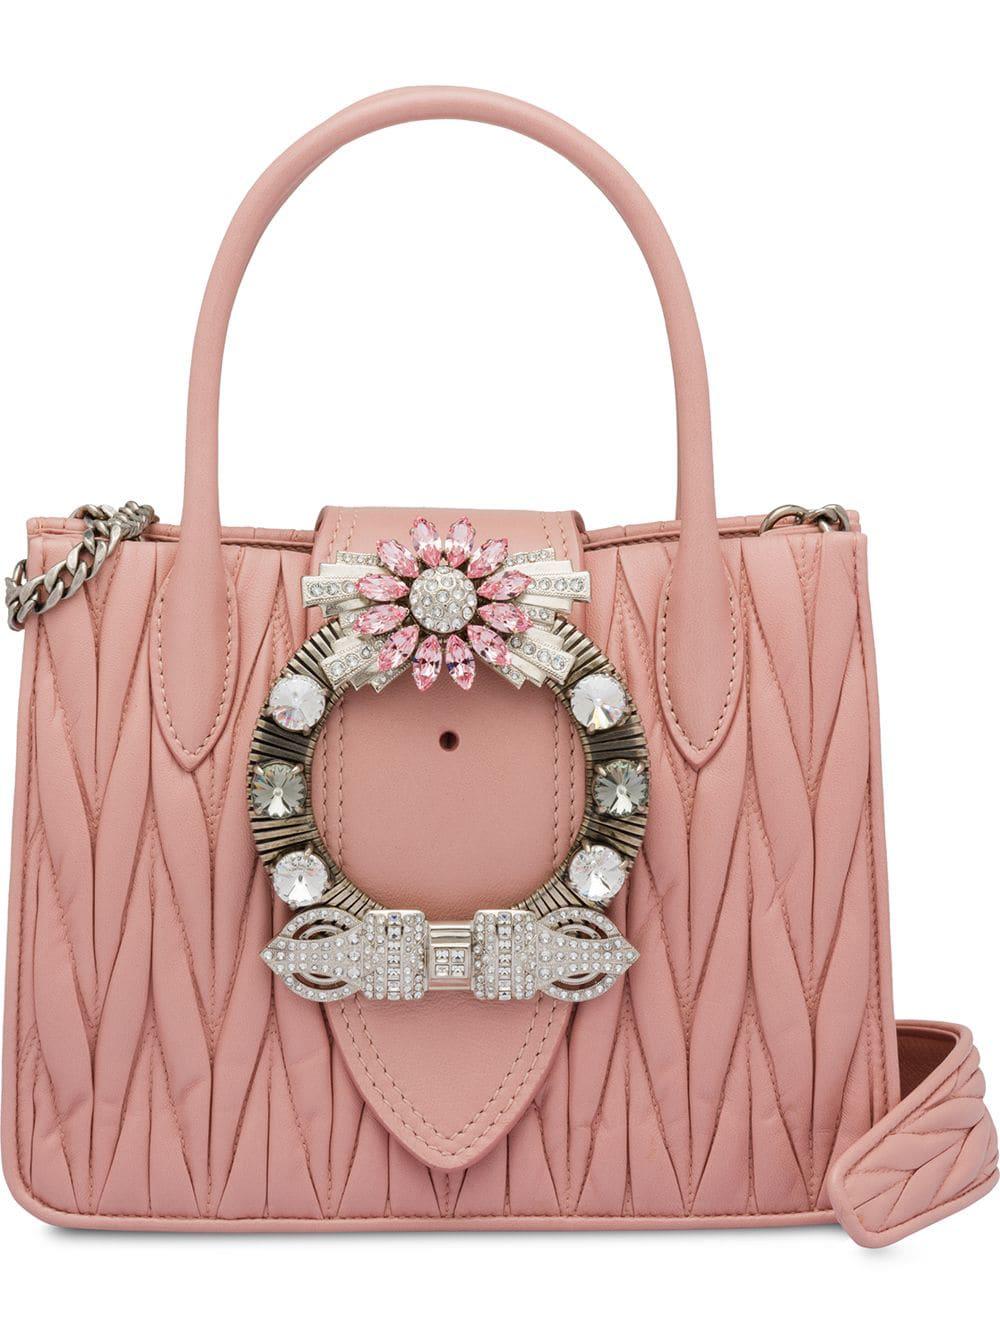 4be3e49479 Miu Miu Miu Lady Matelassé Handbag - Pink